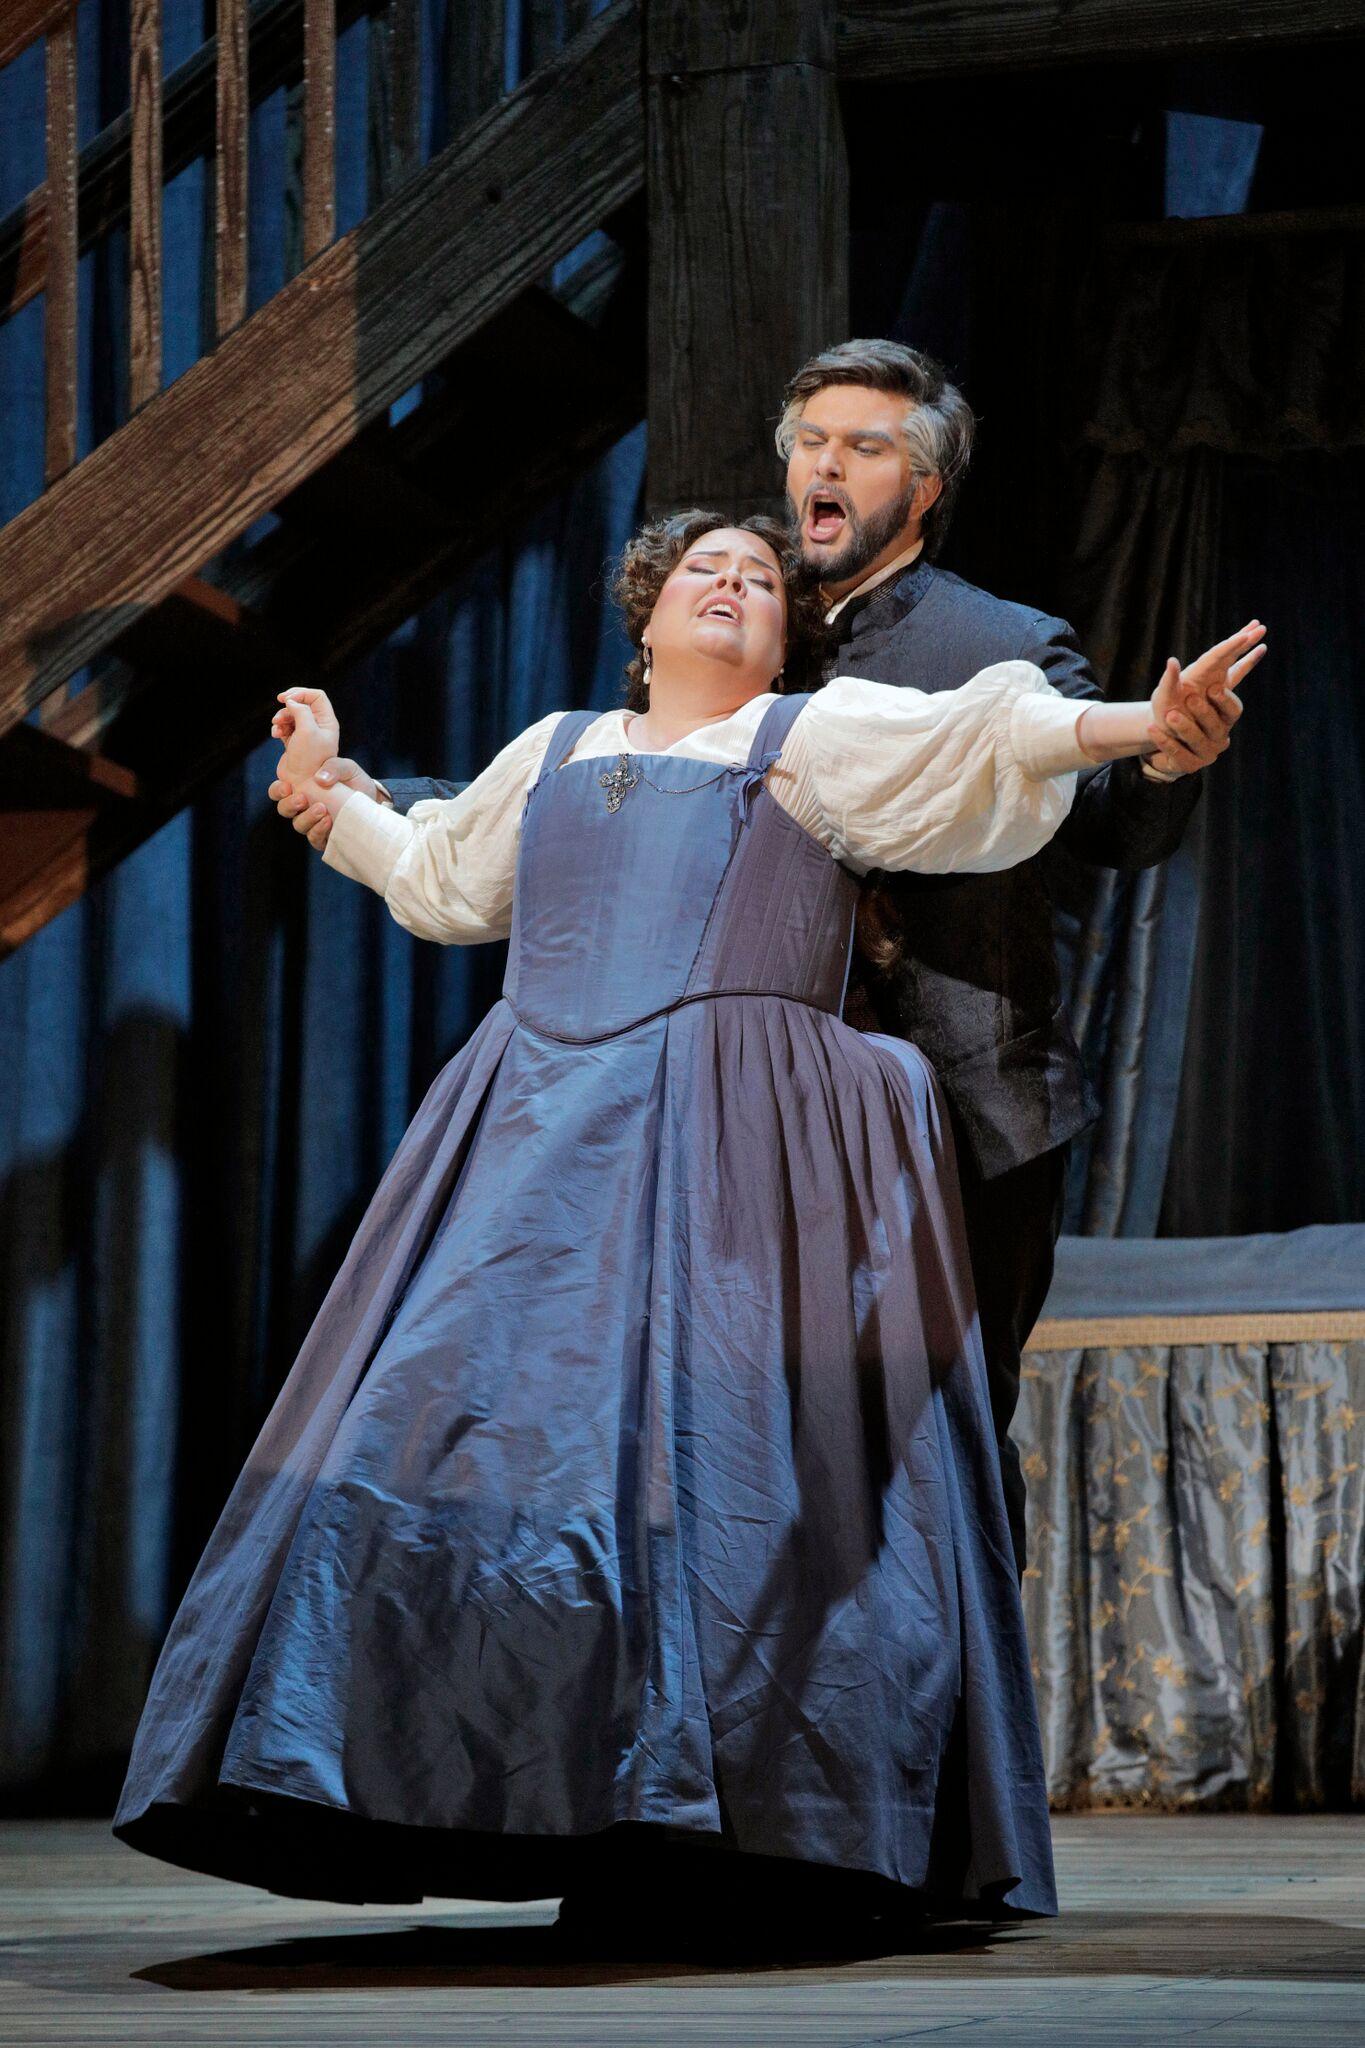 Photo by Cory Weaver for San Francisco Opera